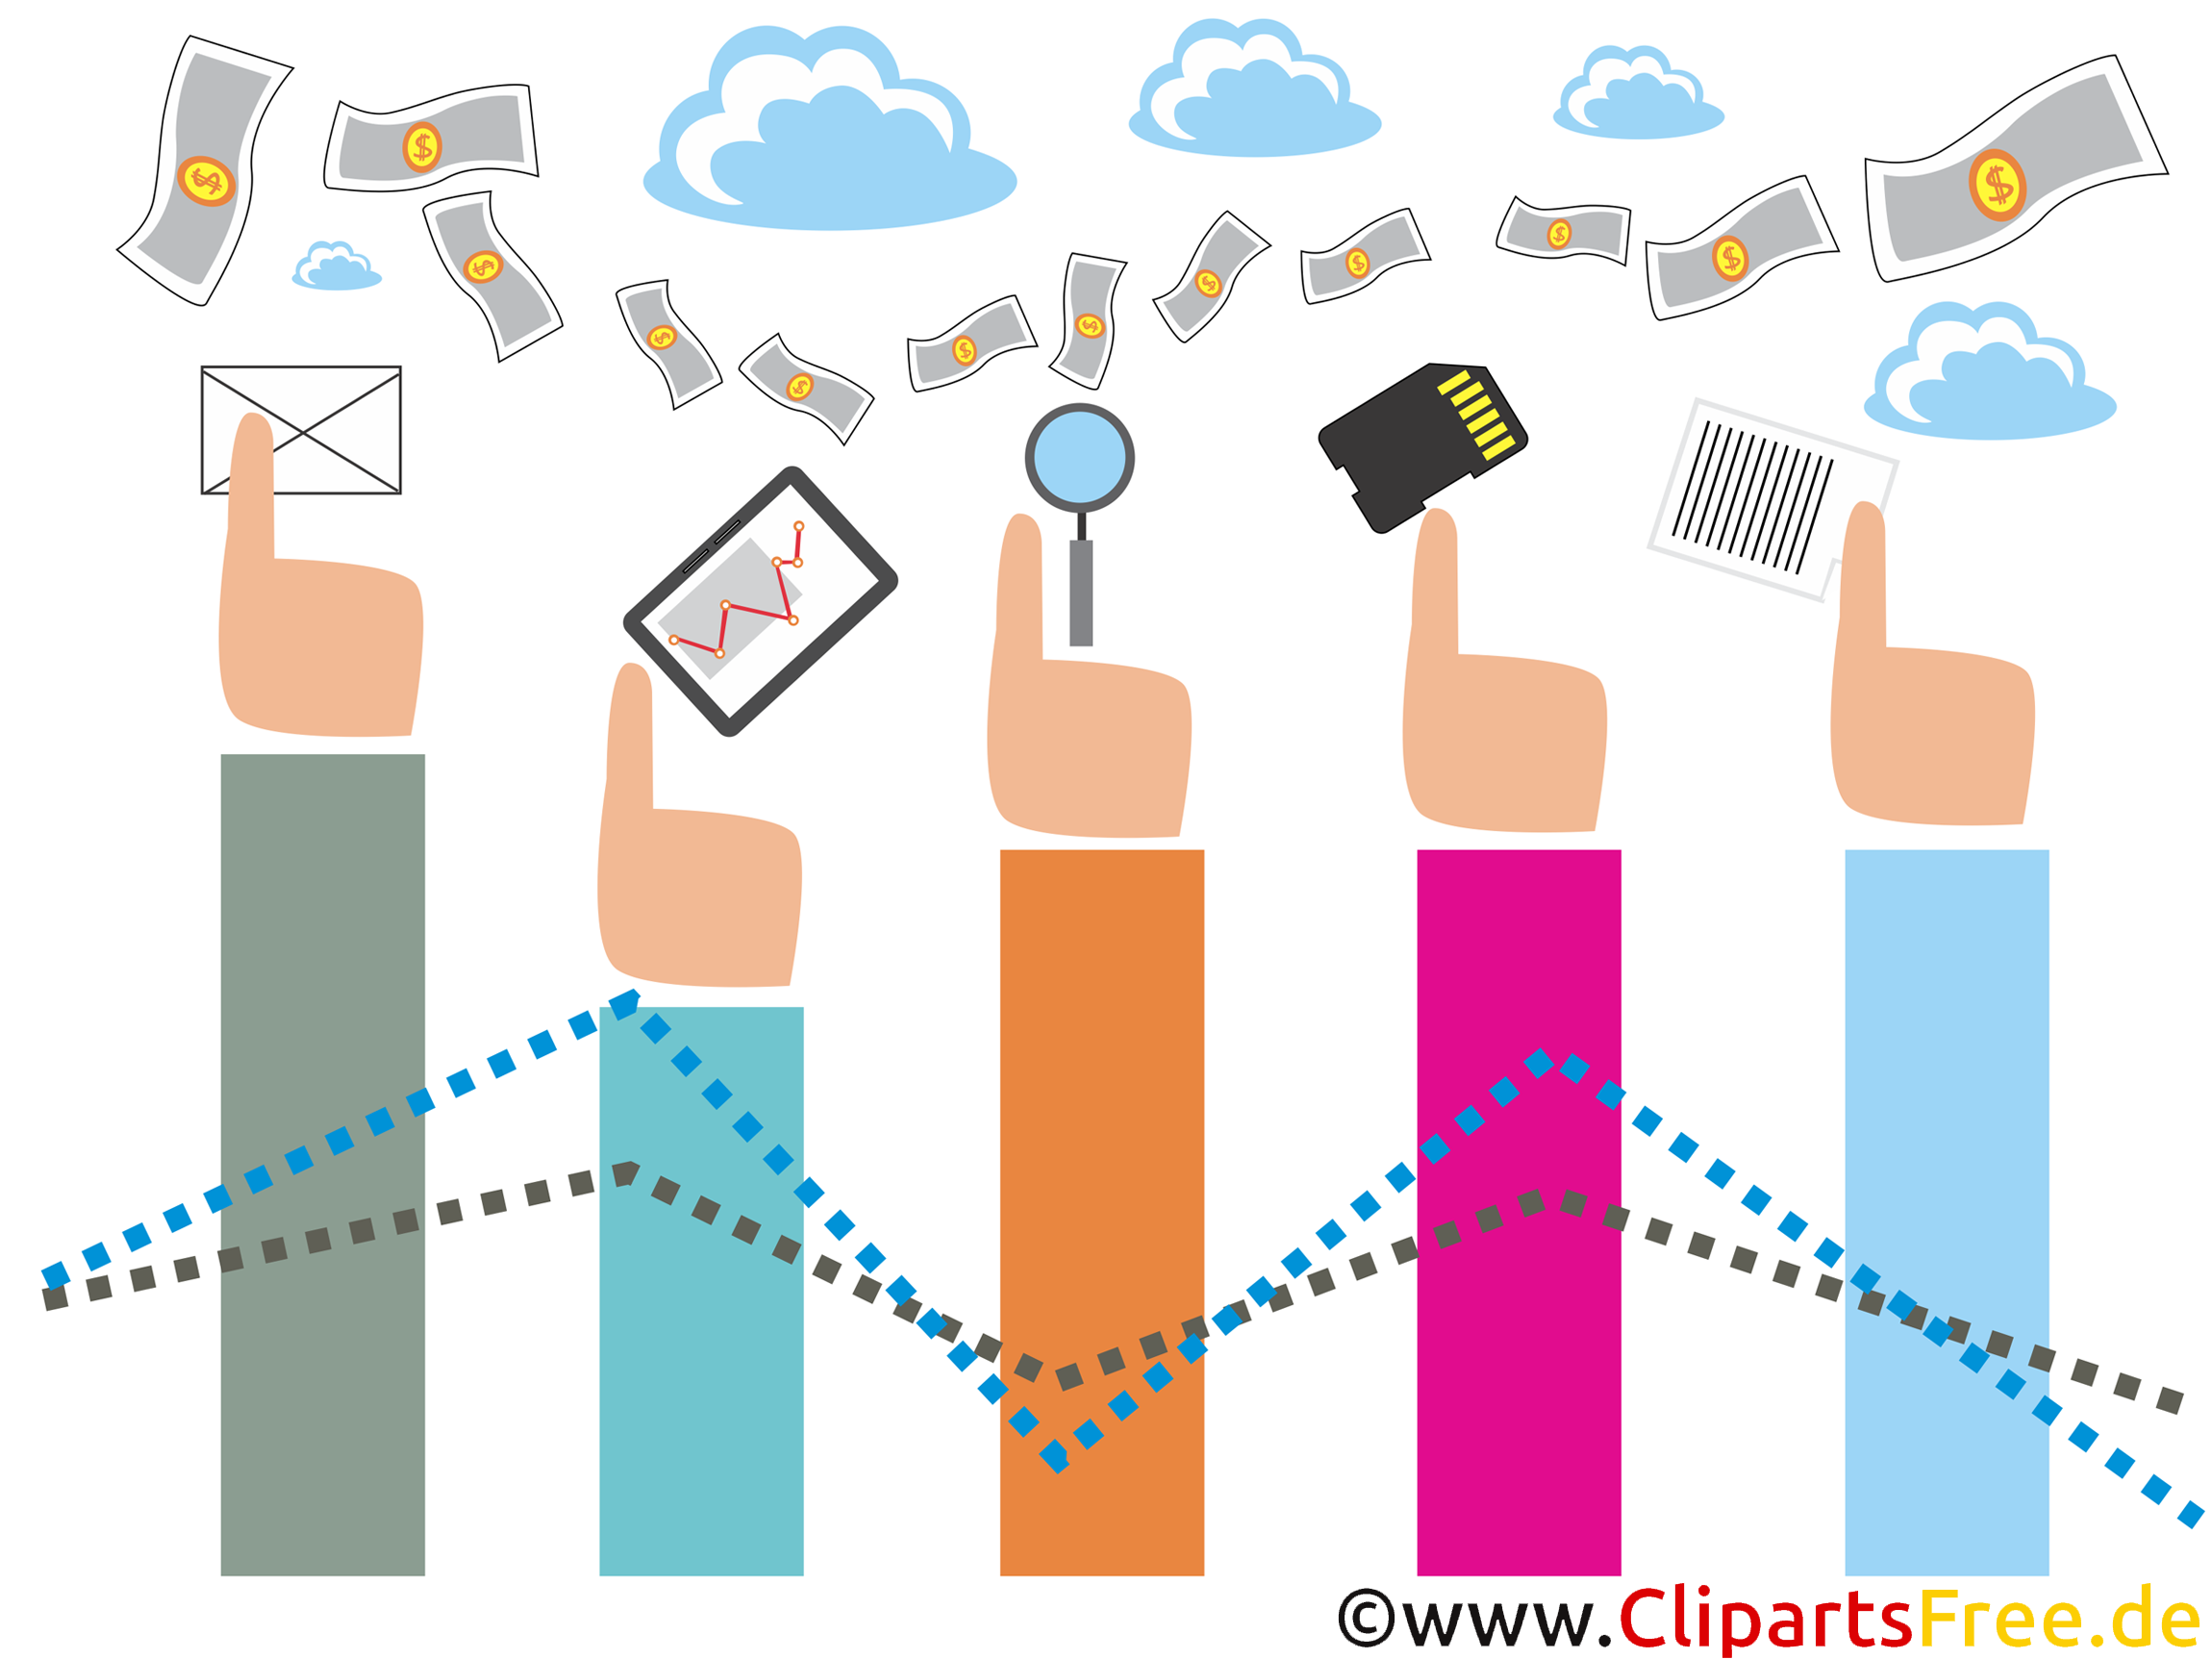 Gratis Illustration StartUps, FinTech, Technologie